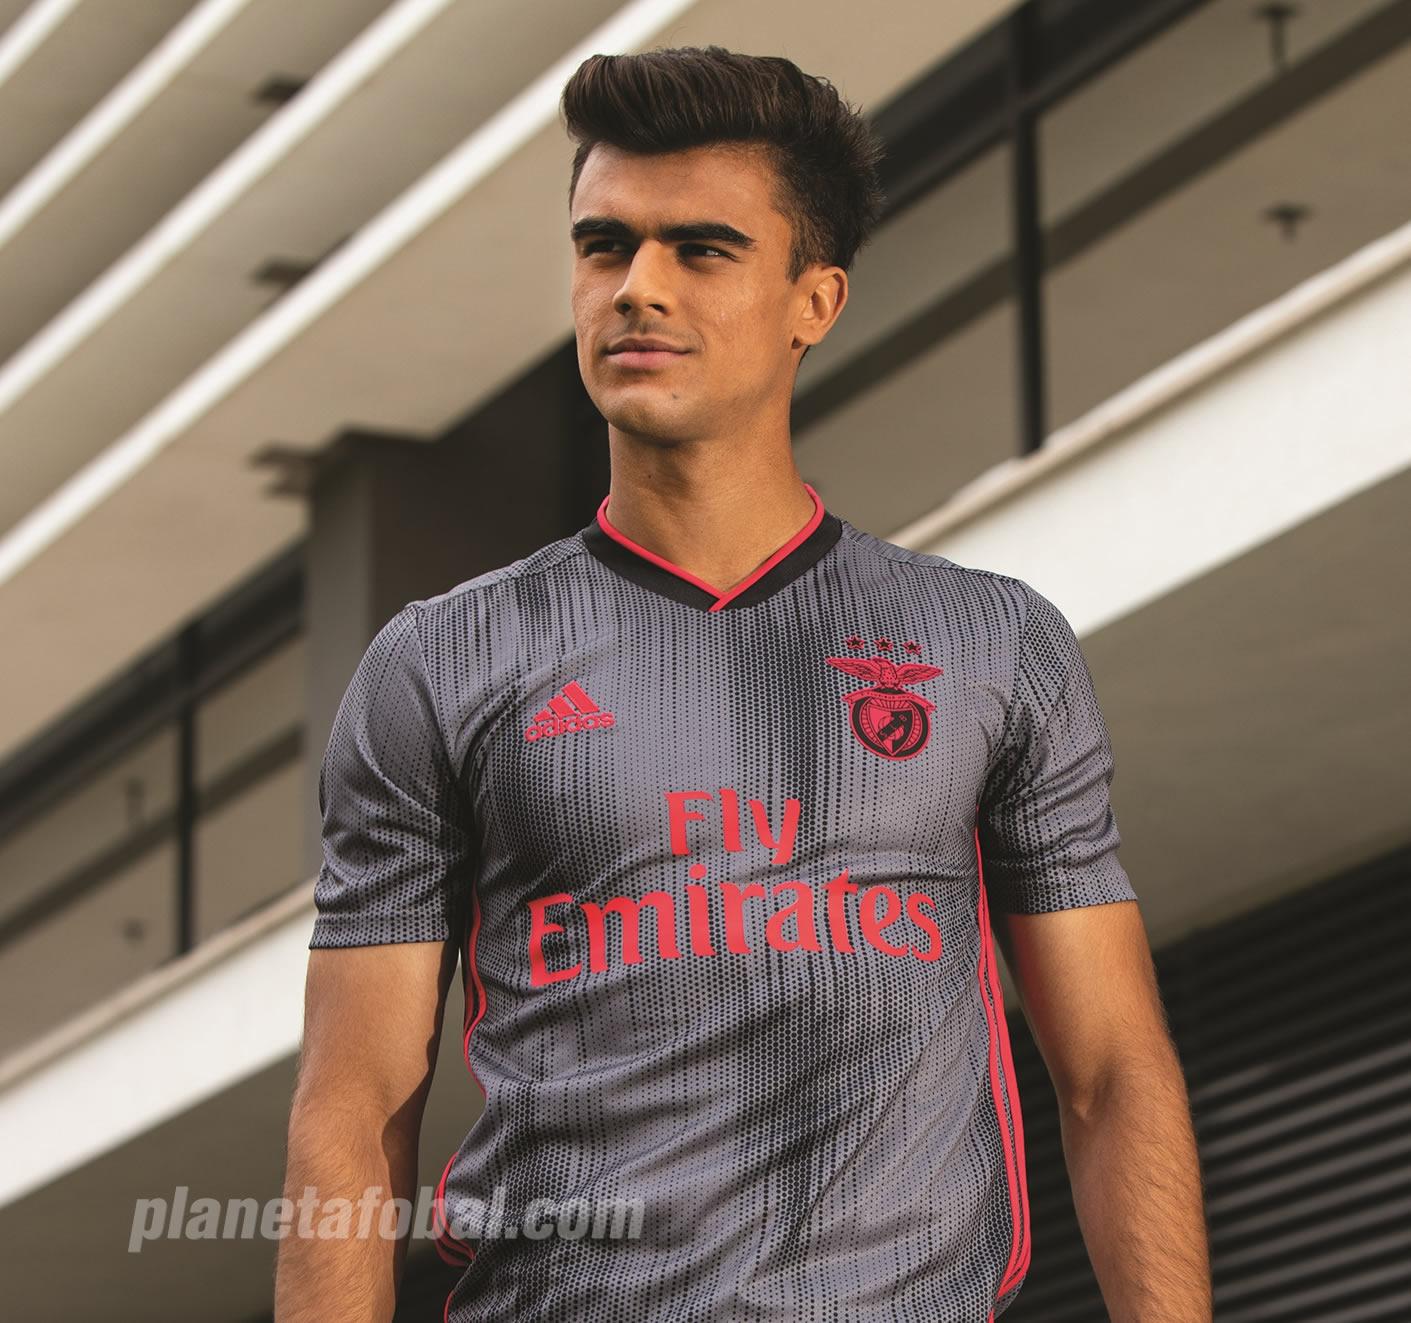 Camiseta suplente del Benfica 2019/20 | Imagen Adidas